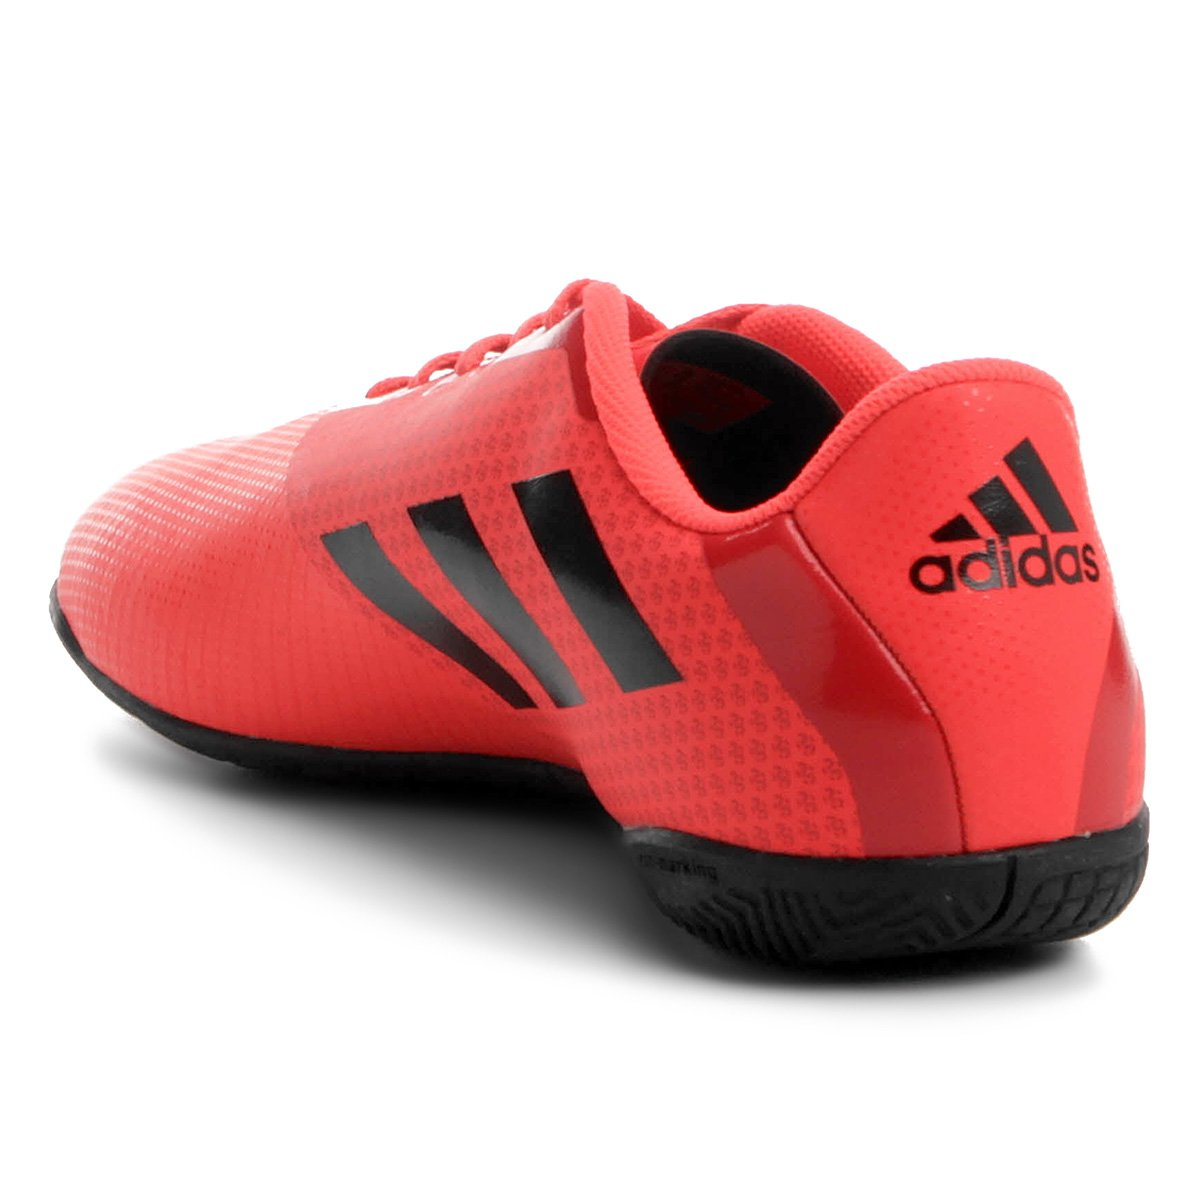 68447148bc Chuteira Futsal Adidas Artilheira 17 IN